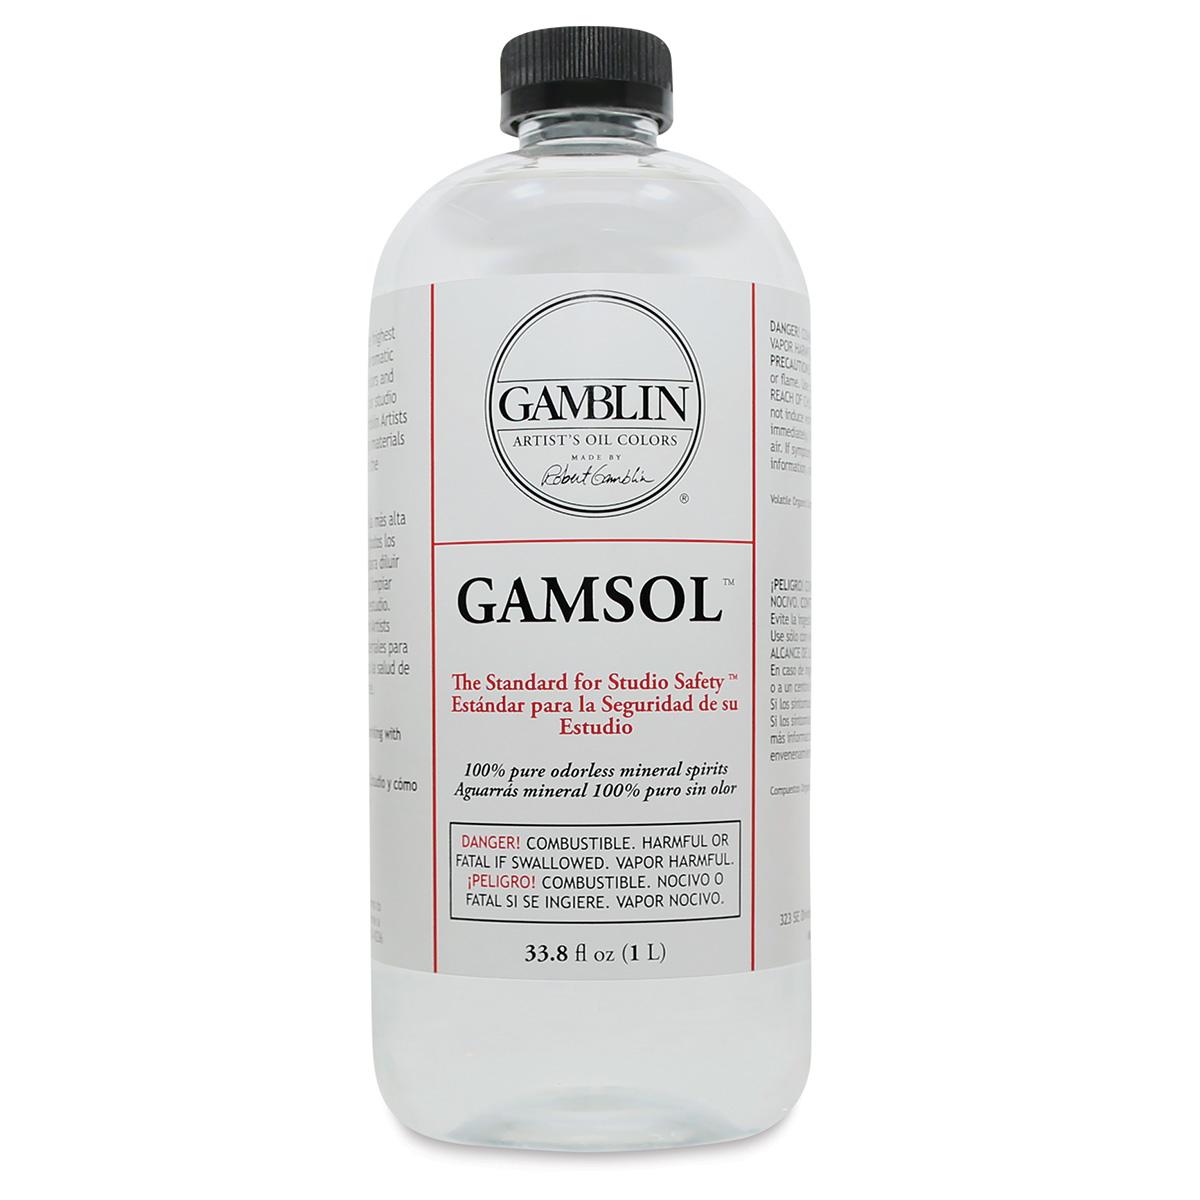 Gamblin Gamsol Odorless Mineral Spirits - 33.8 oz